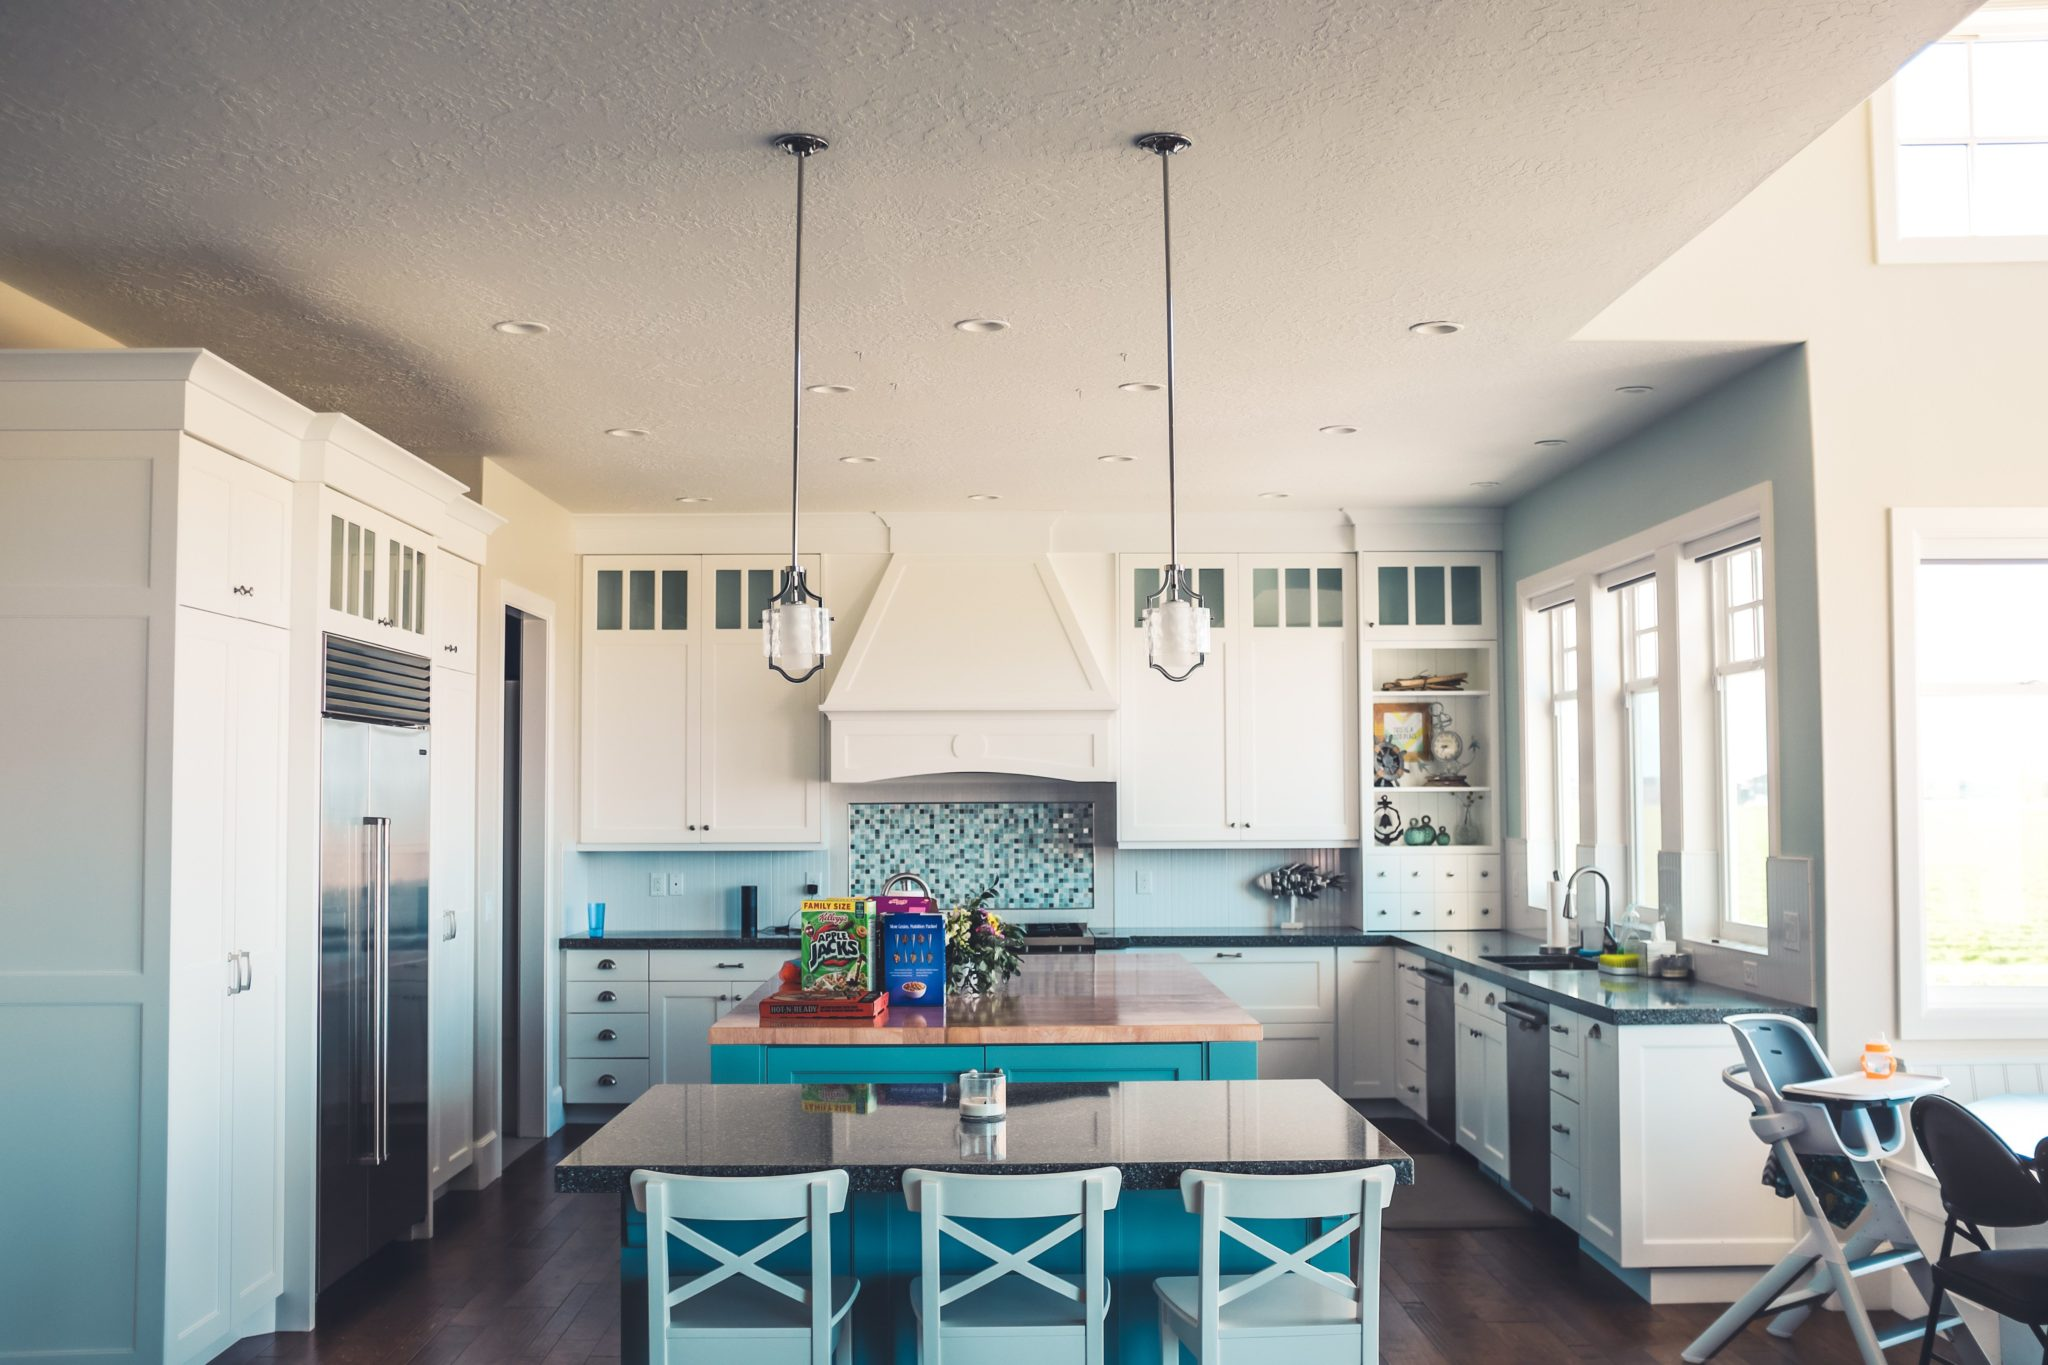 Best Kitchen Appliances & Gadgets for Families - One Frazzled Mum